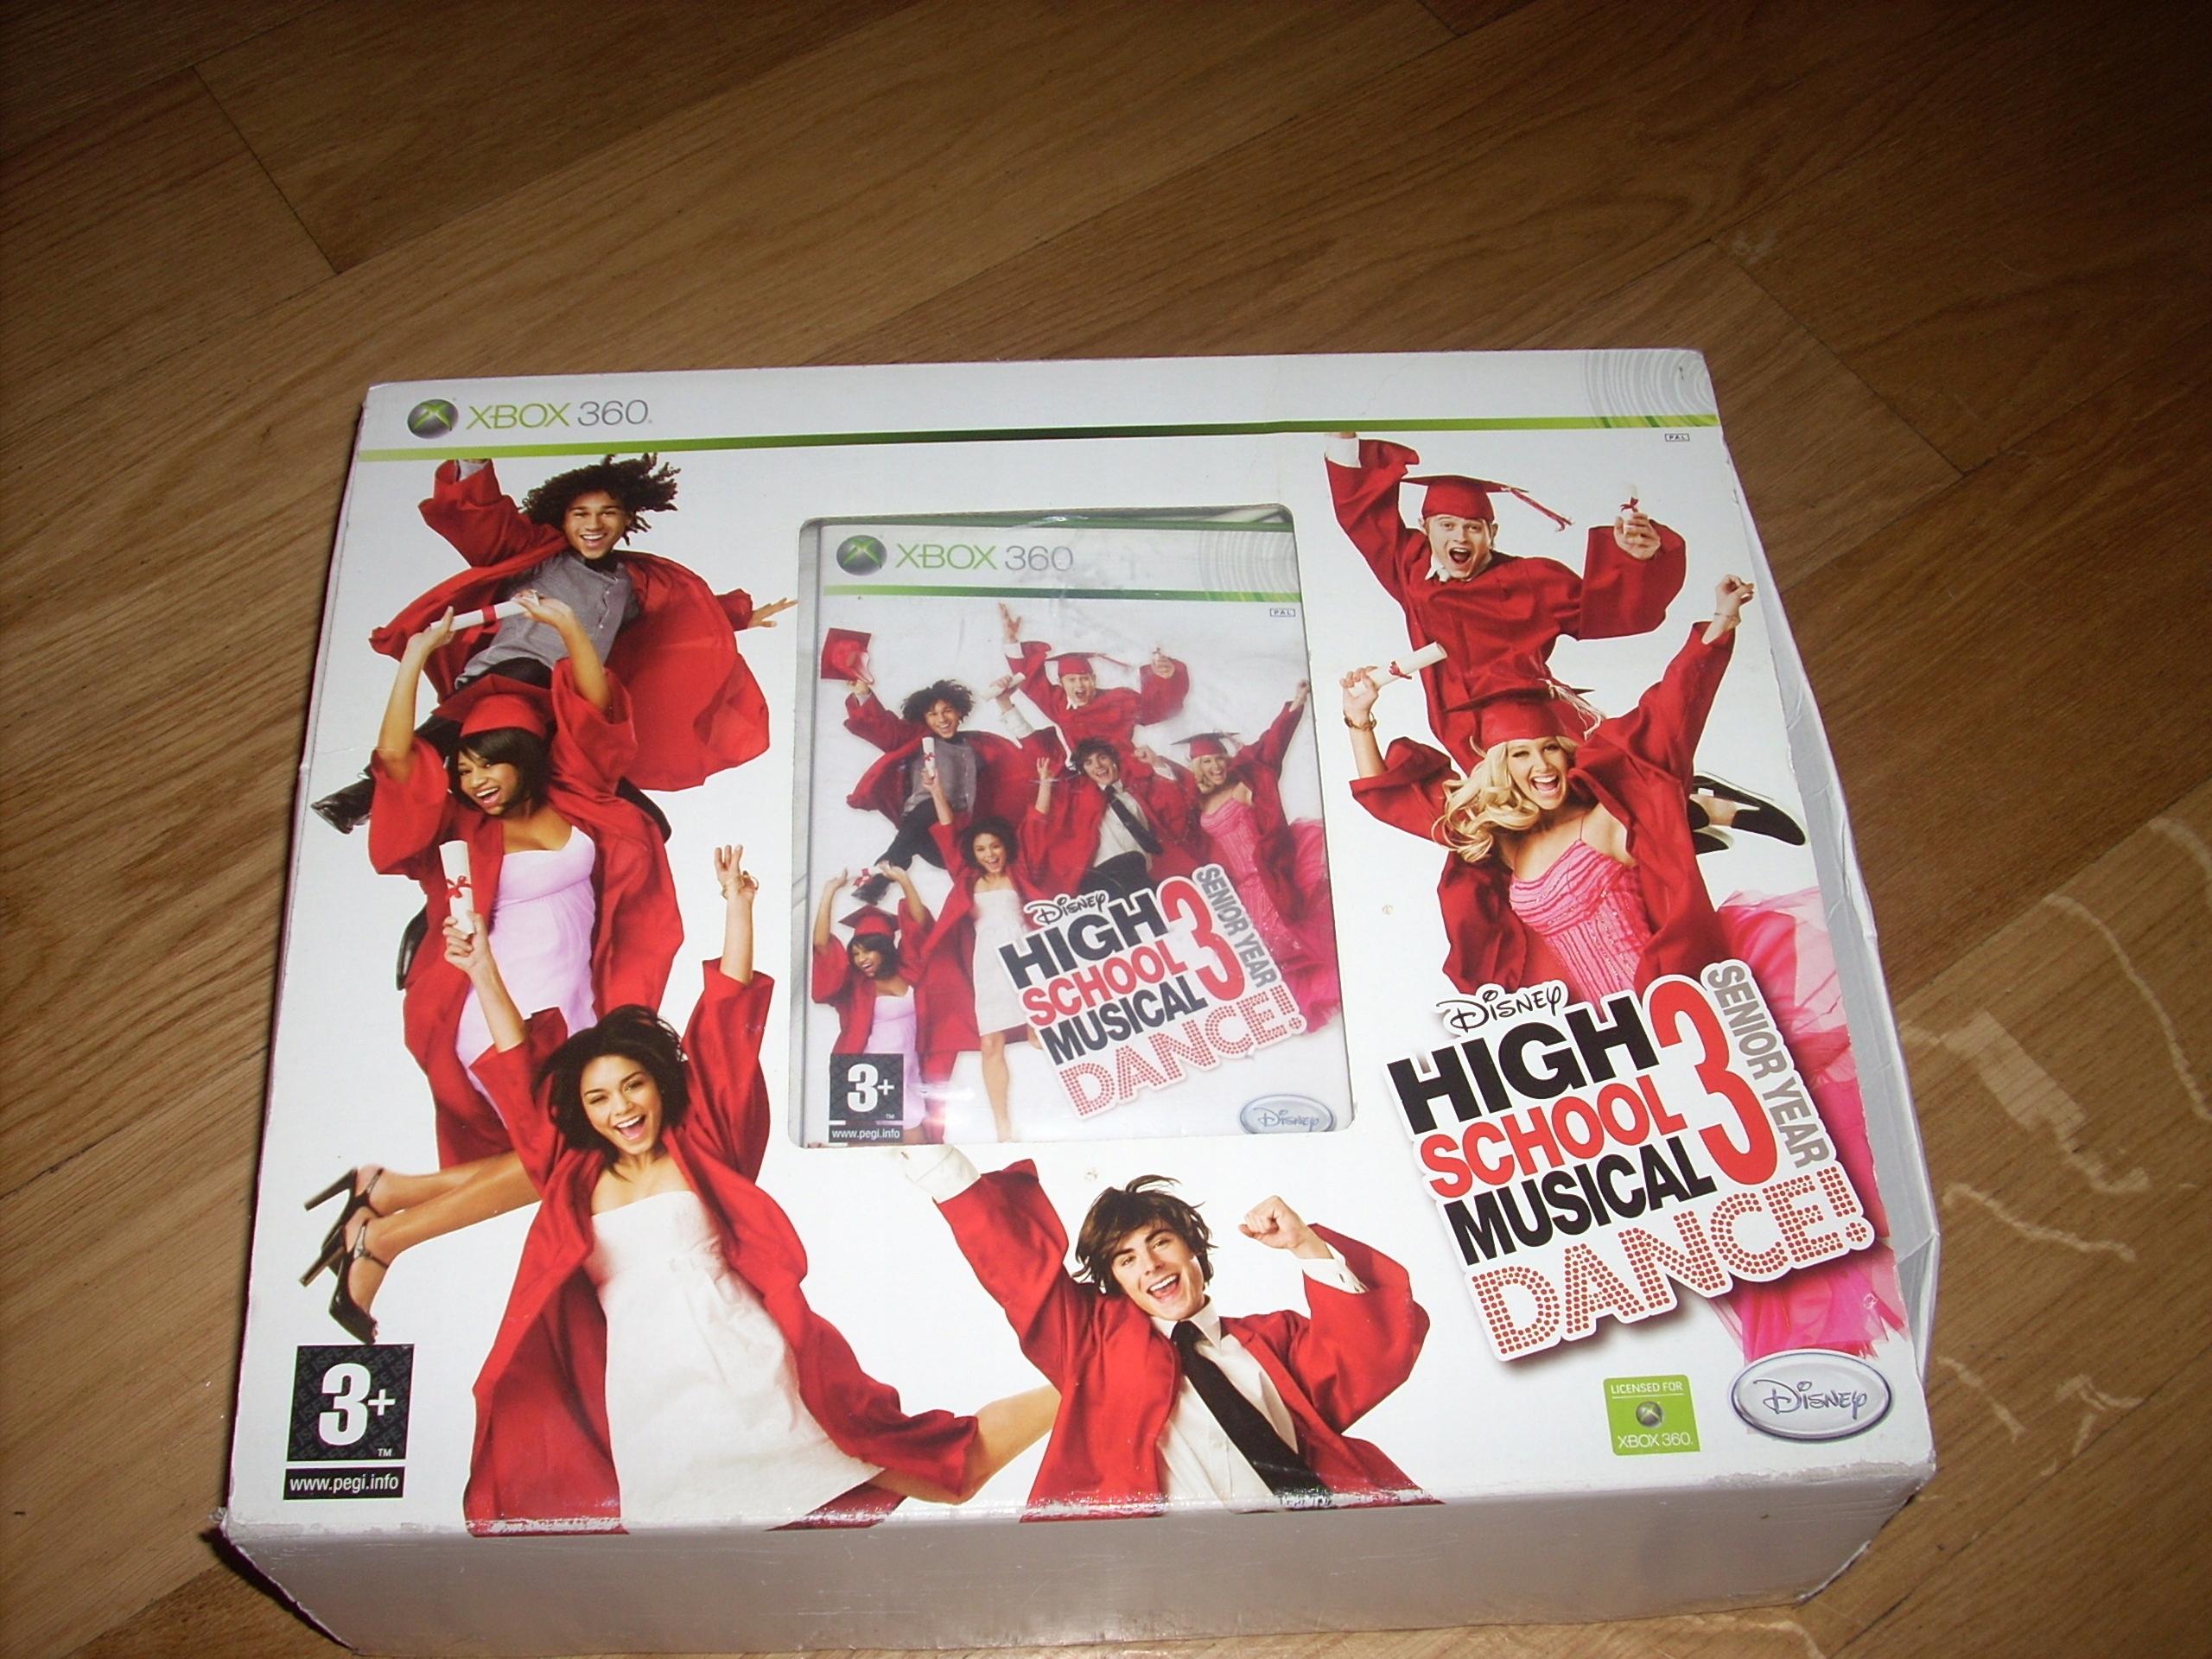 Xbox 360 High school musical 3 senior year: dance